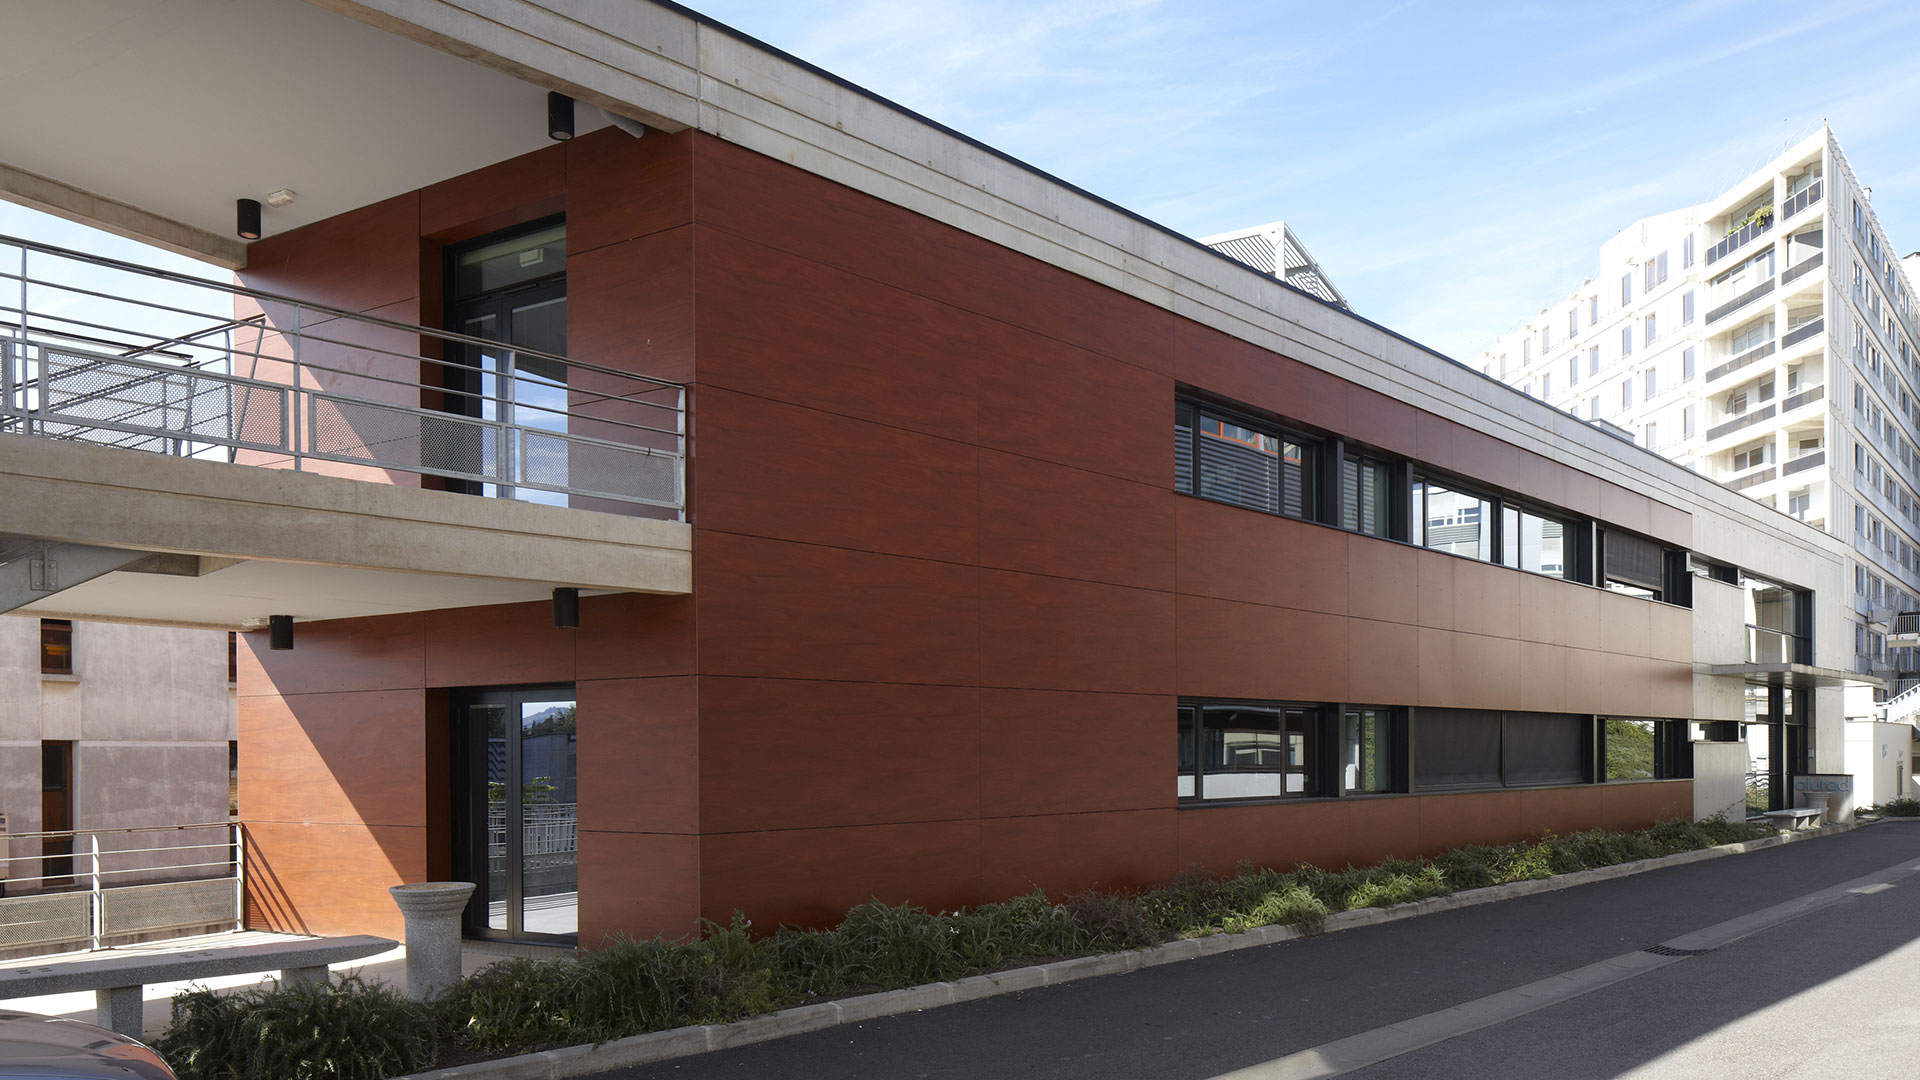 Slider-Locaux-de-dialyse—Brive